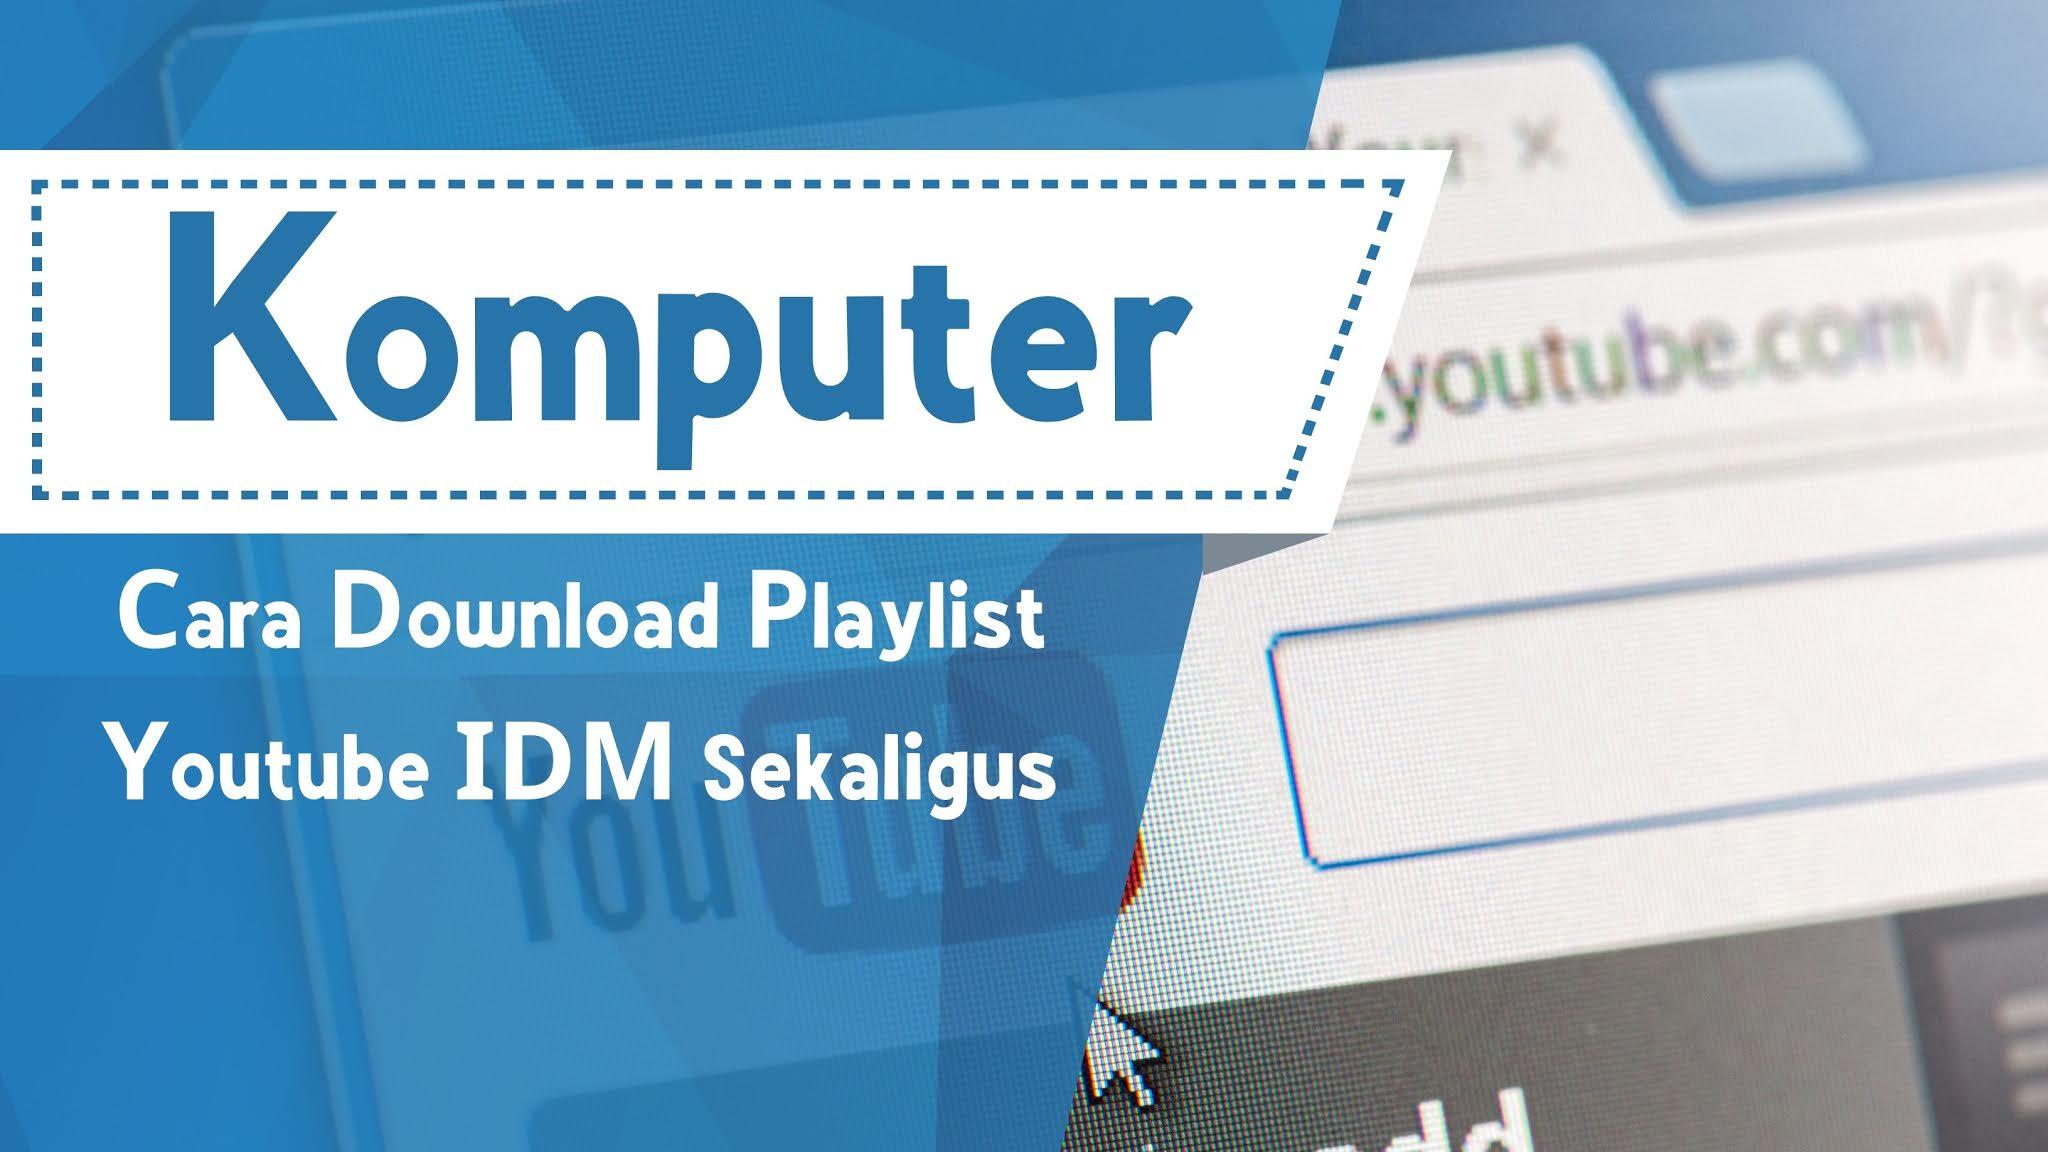 Cara Download Playlist Youtube IDM Sekaligus